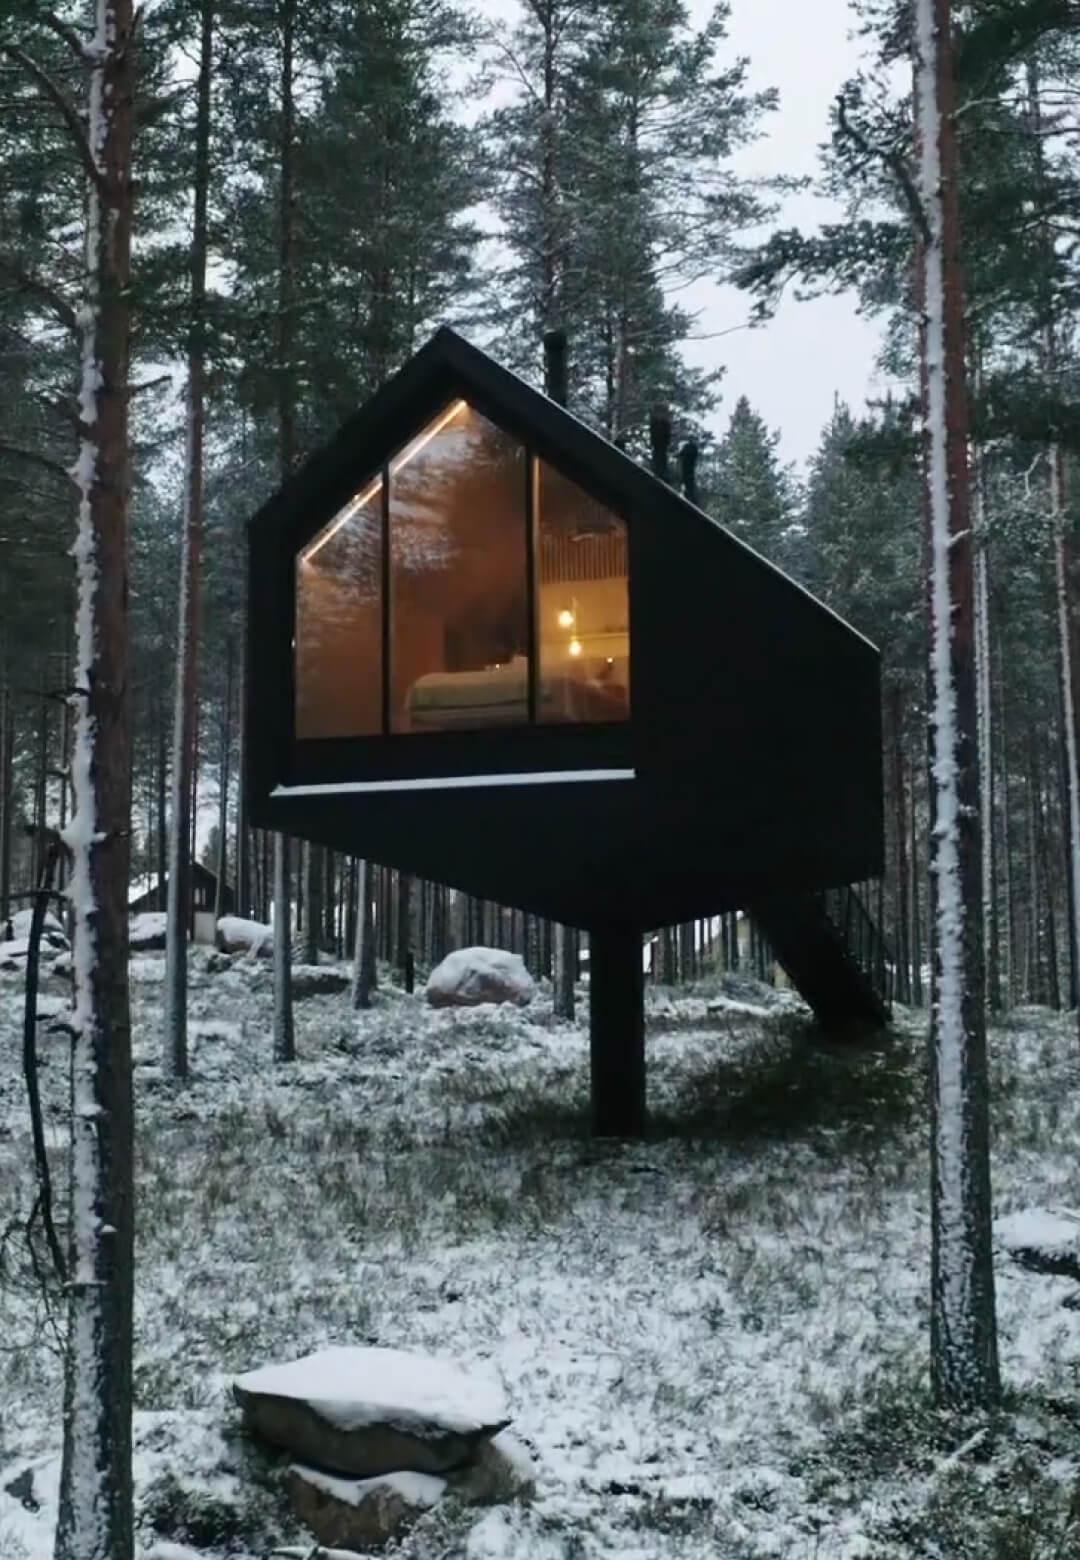 Studio Puisto's Niliaiita Cabin | Niliaiita Cabin | Studio Puisto | STIRworld